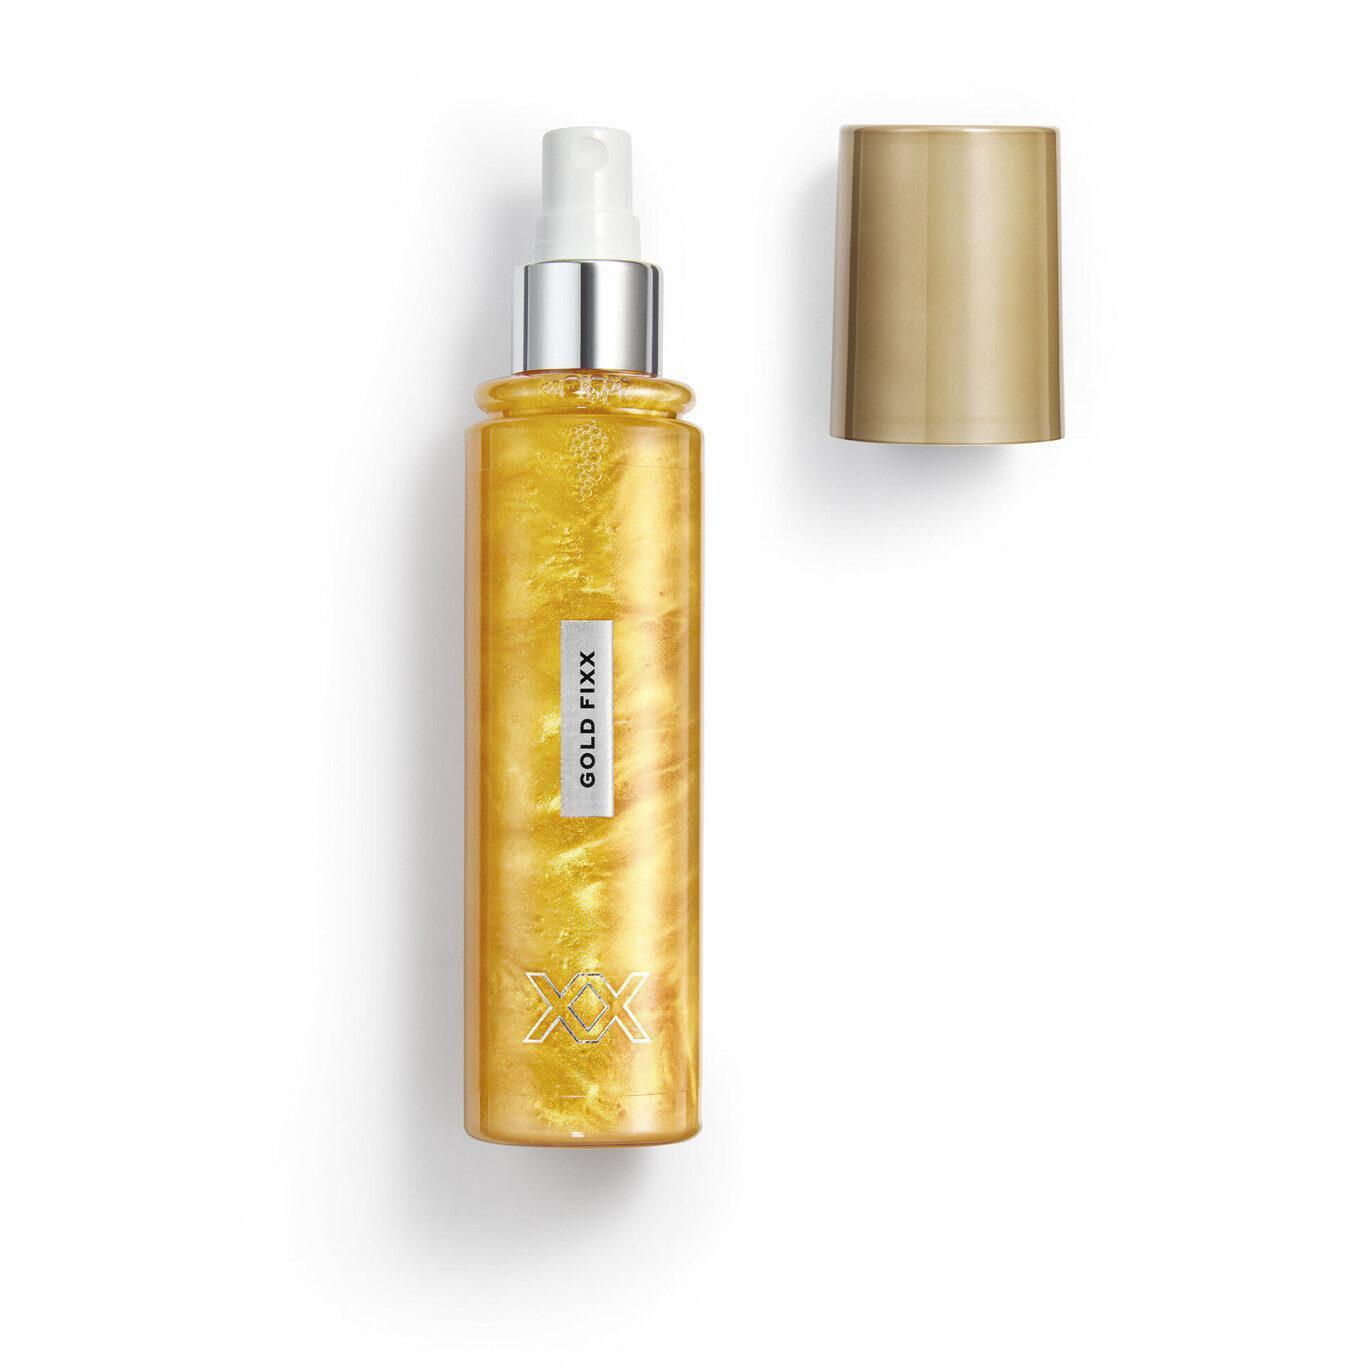 XX Revolution MetaliXX Gold FiXX Setting Spray Open